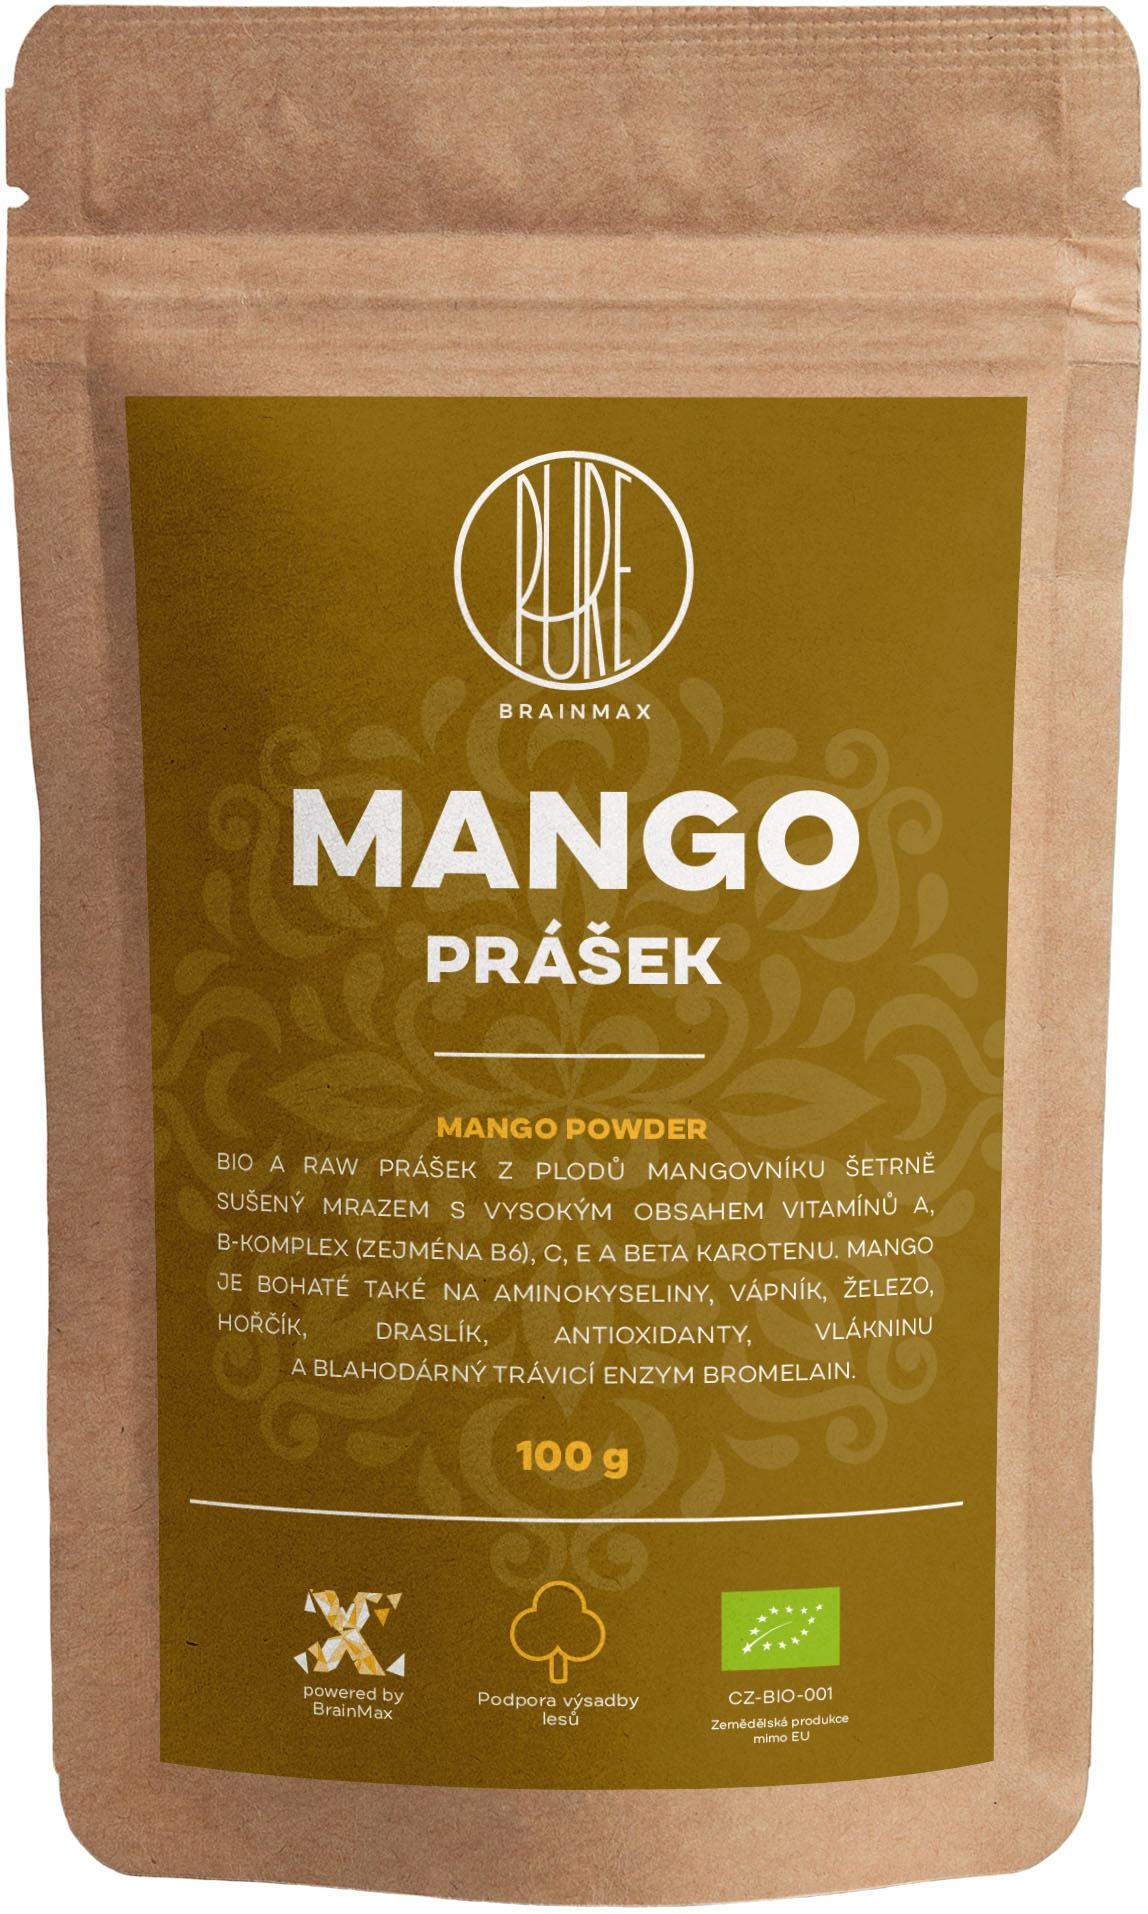 BrainMax Pure Mango BIO prášek, 100 g *CZ-BIO-001 certifikát